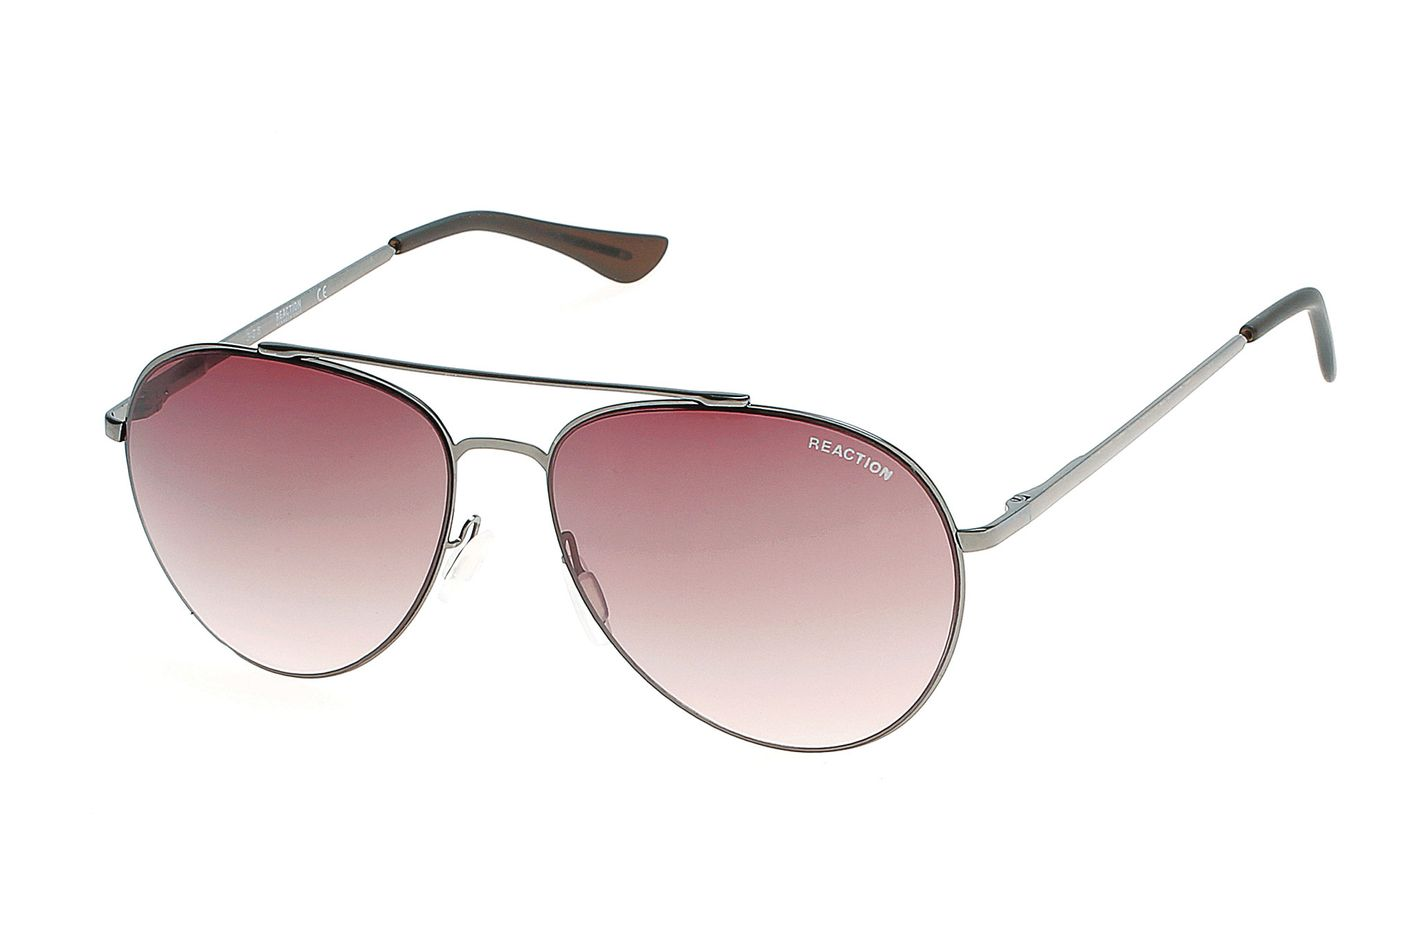 Gradient Smoke Gunmetal Aviator Sunglasses